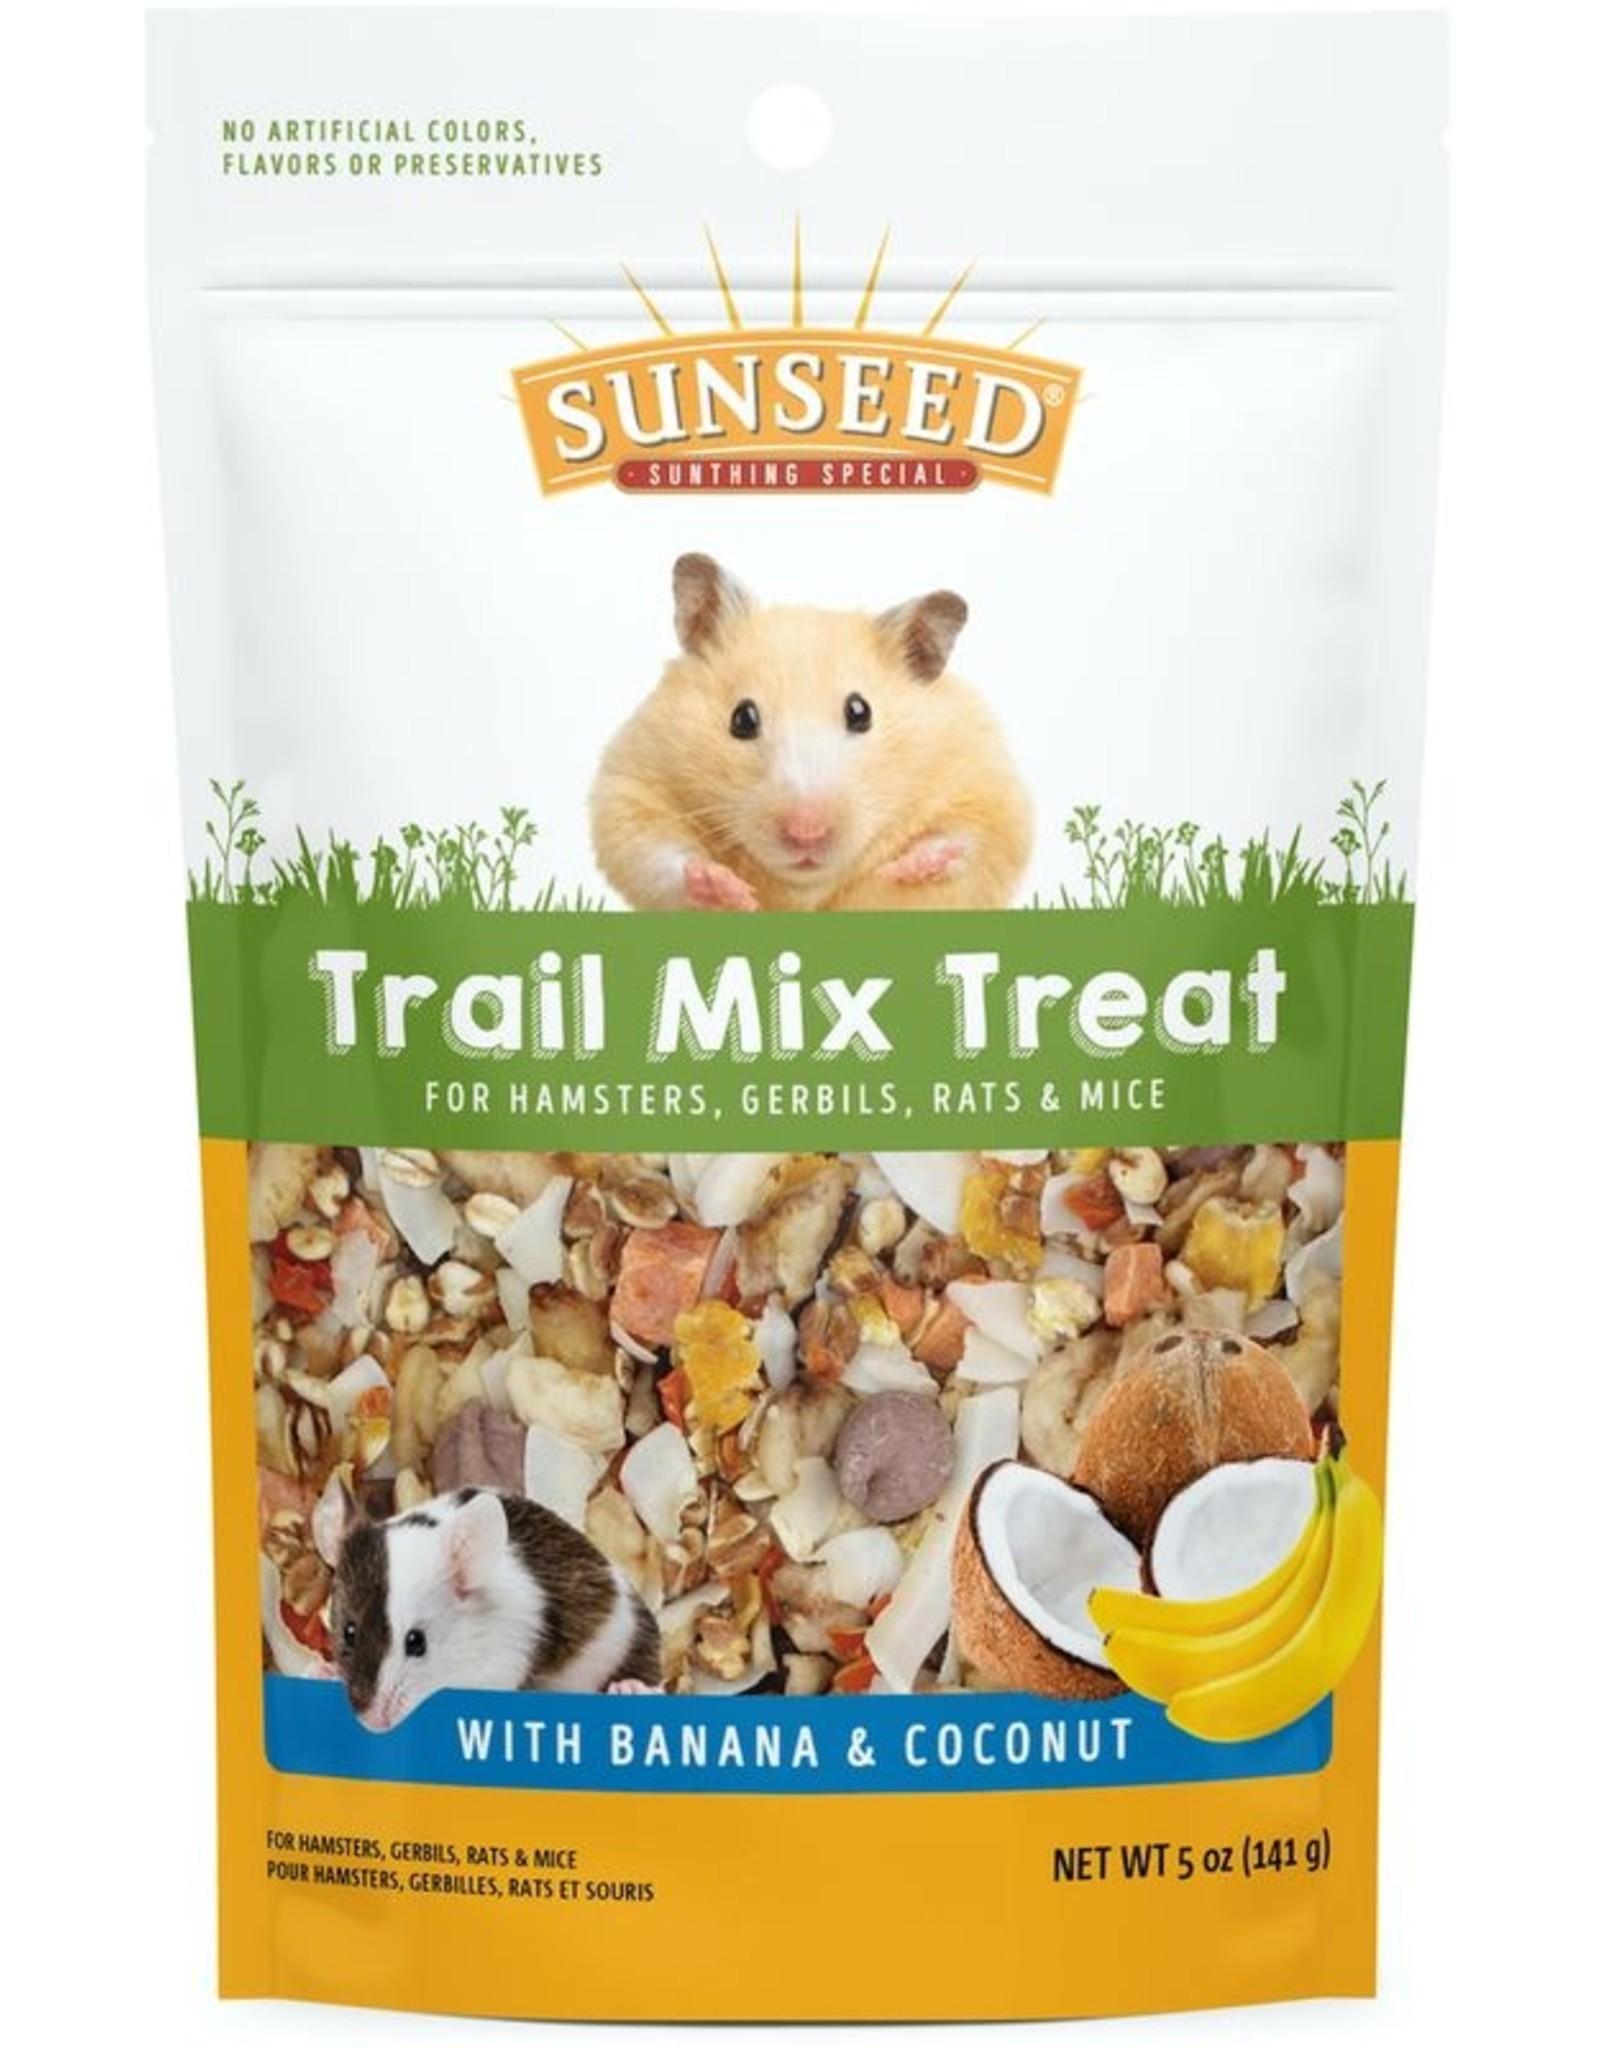 Sunseed Banana Coconut Trail Mix Treat